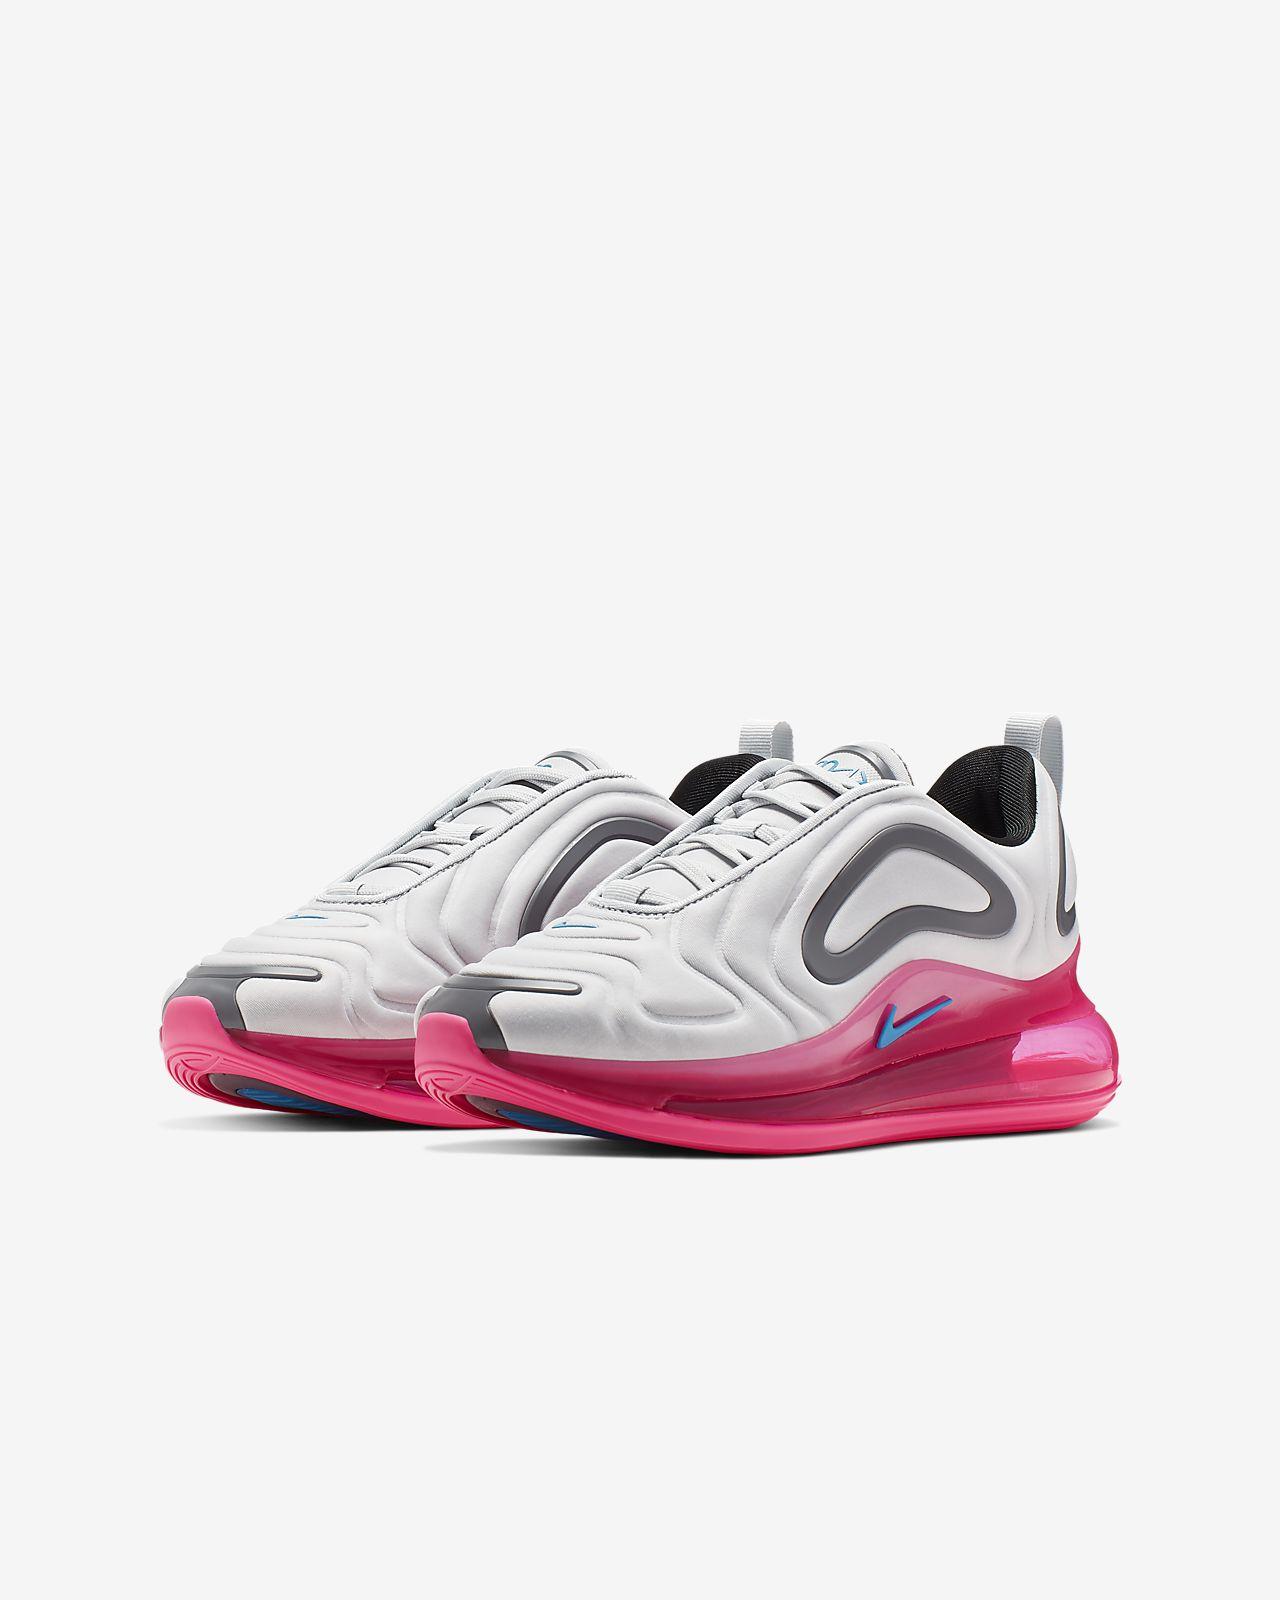 Nike Air Max 720 Schuh für jüngereältere Kinder. Nike CH